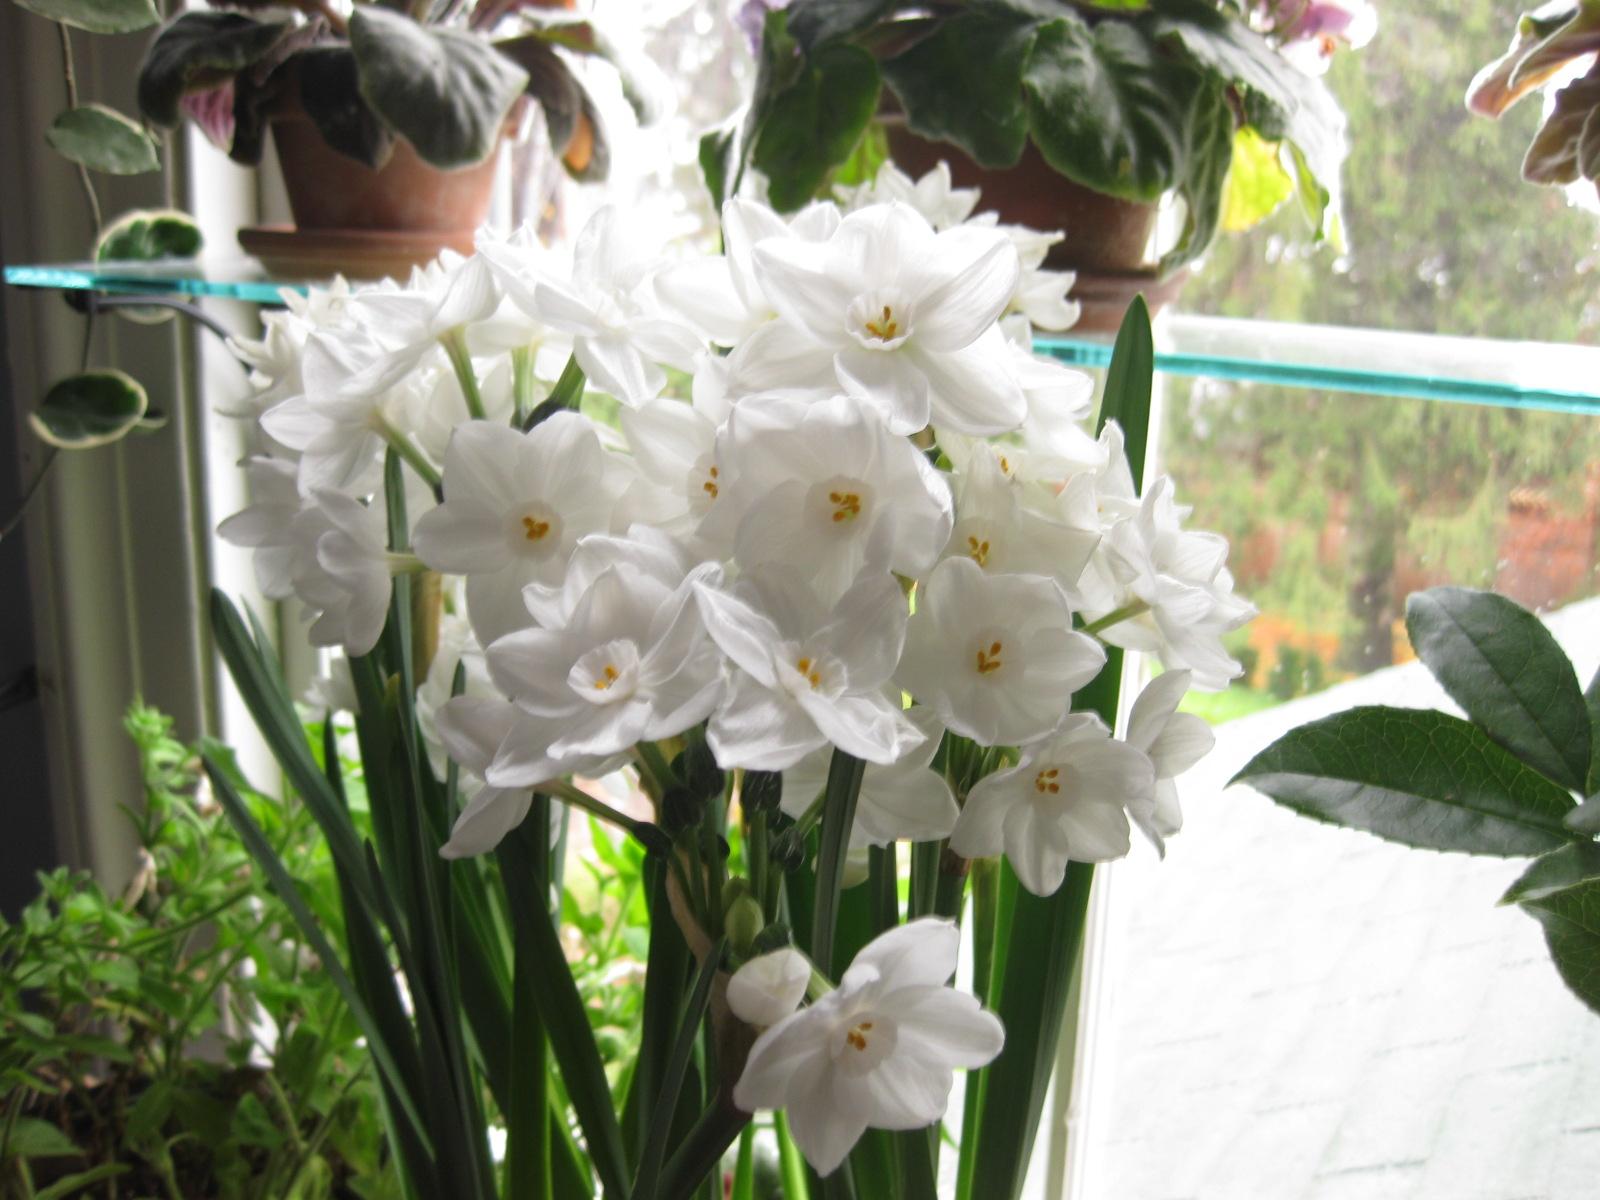 Pickled Paperwhites Narcissus Grandiflora